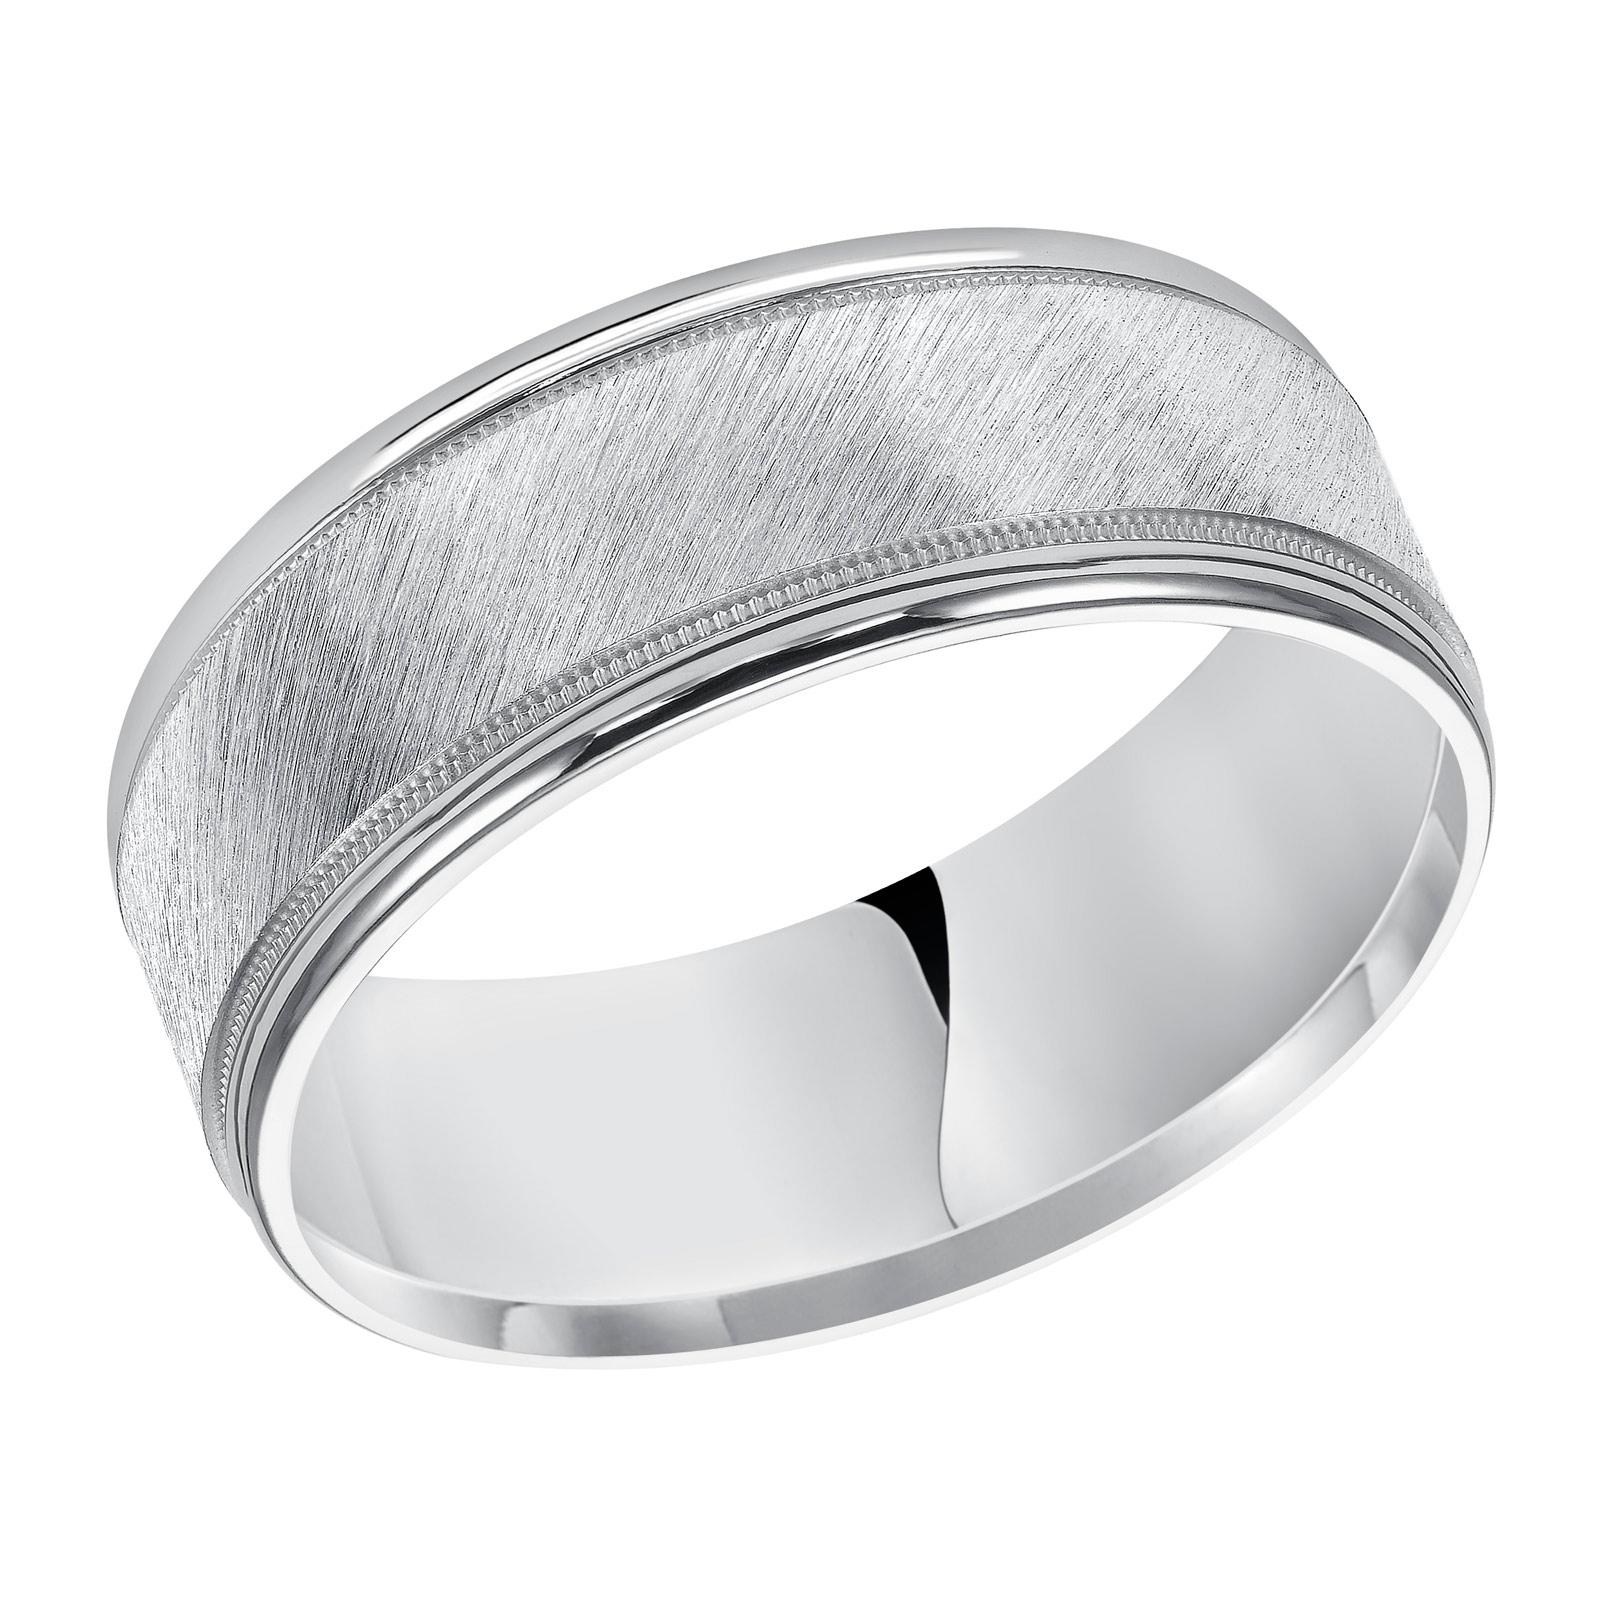 Goldman ring 11 12s4w8 g00 long island ny mens wedding for Long island wedding bands